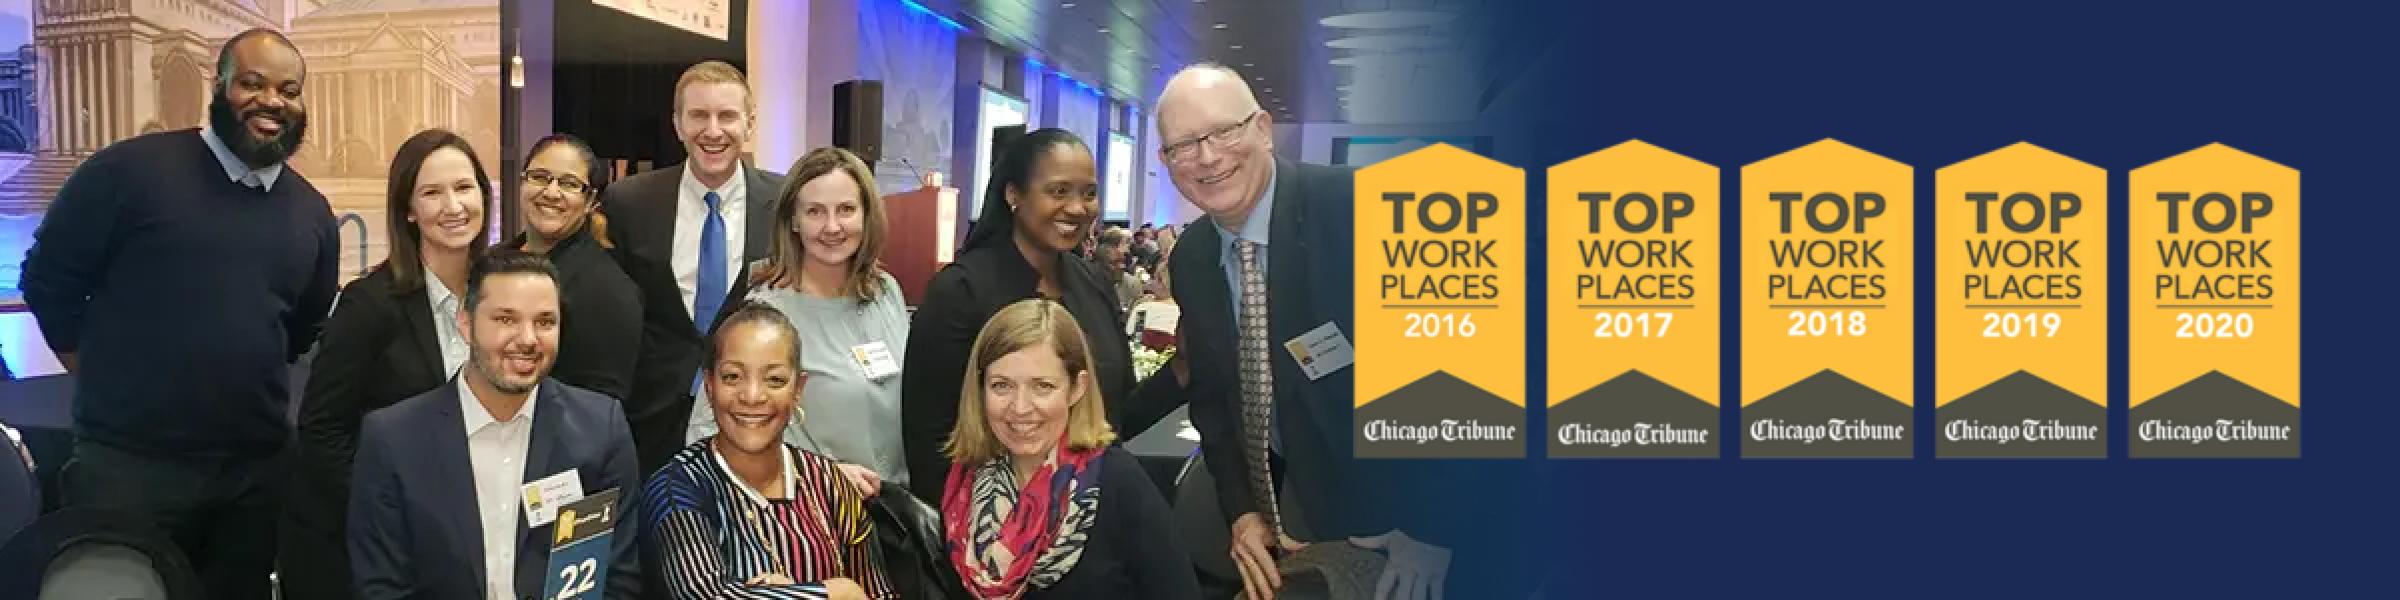 Top Work Places - Chicago Tribune